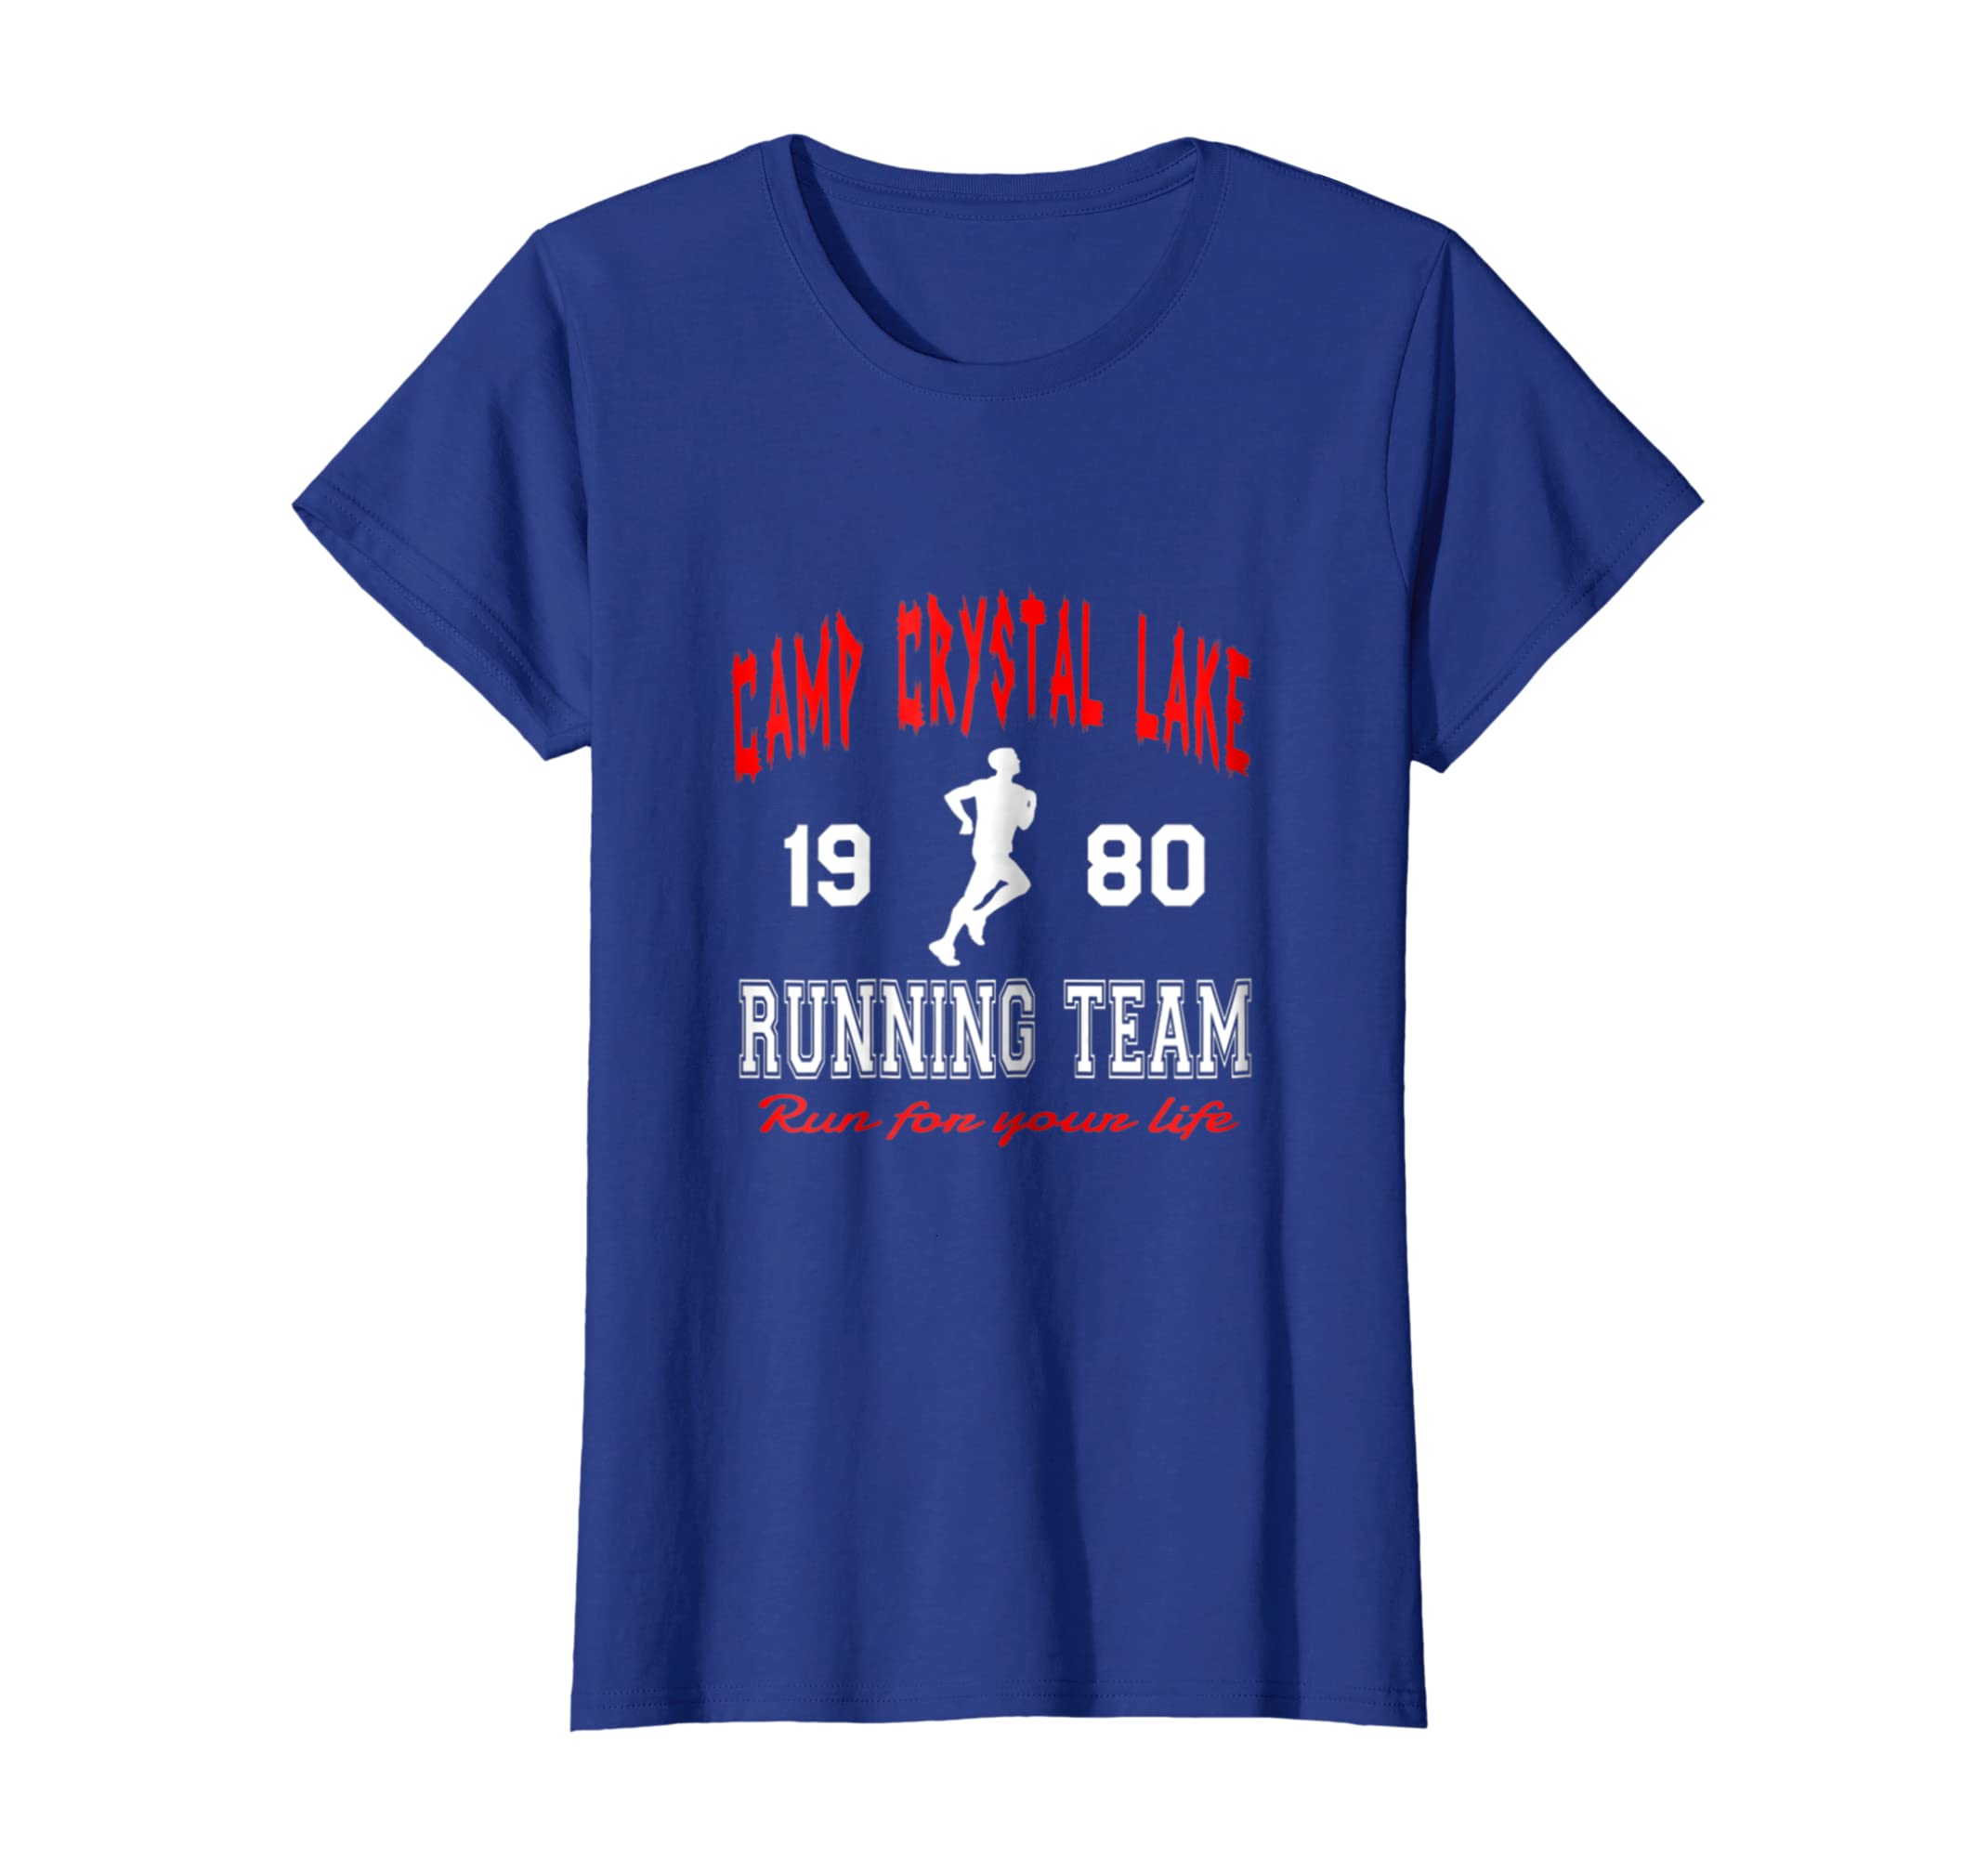 a5fb8bea8 Amazon.com: Camp Crystal Lake 1980 Running Team Run For Your Life Tshirt:  Clothing